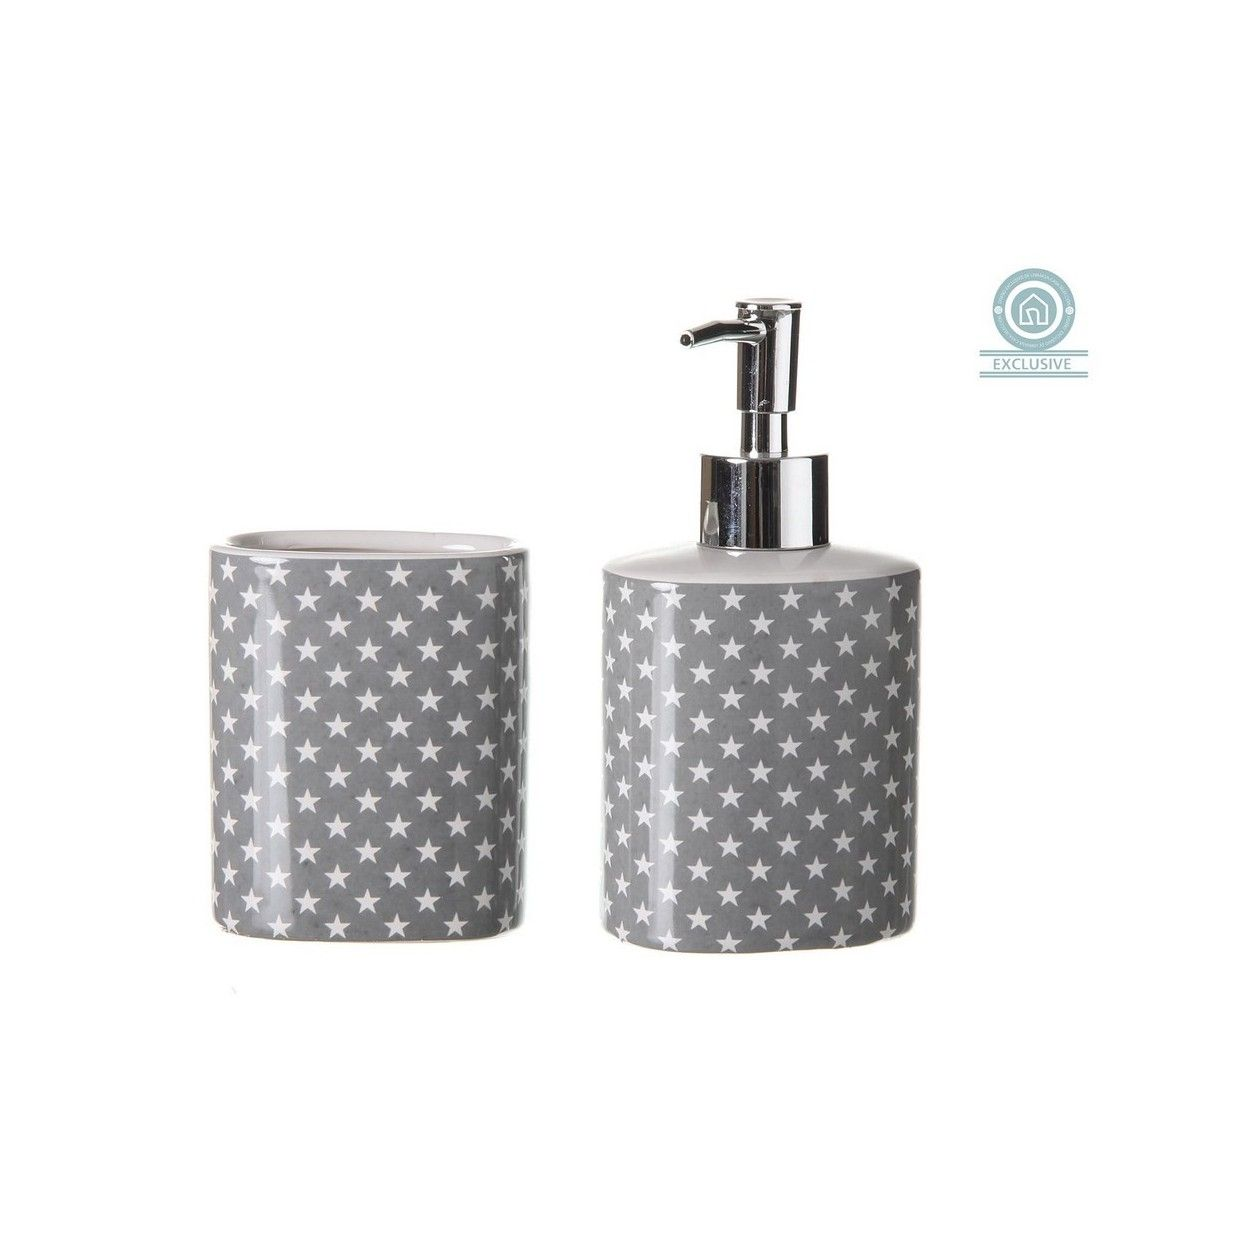 Dosificador de jab n original gris con vaso star hogar for Dosificador jabon bano